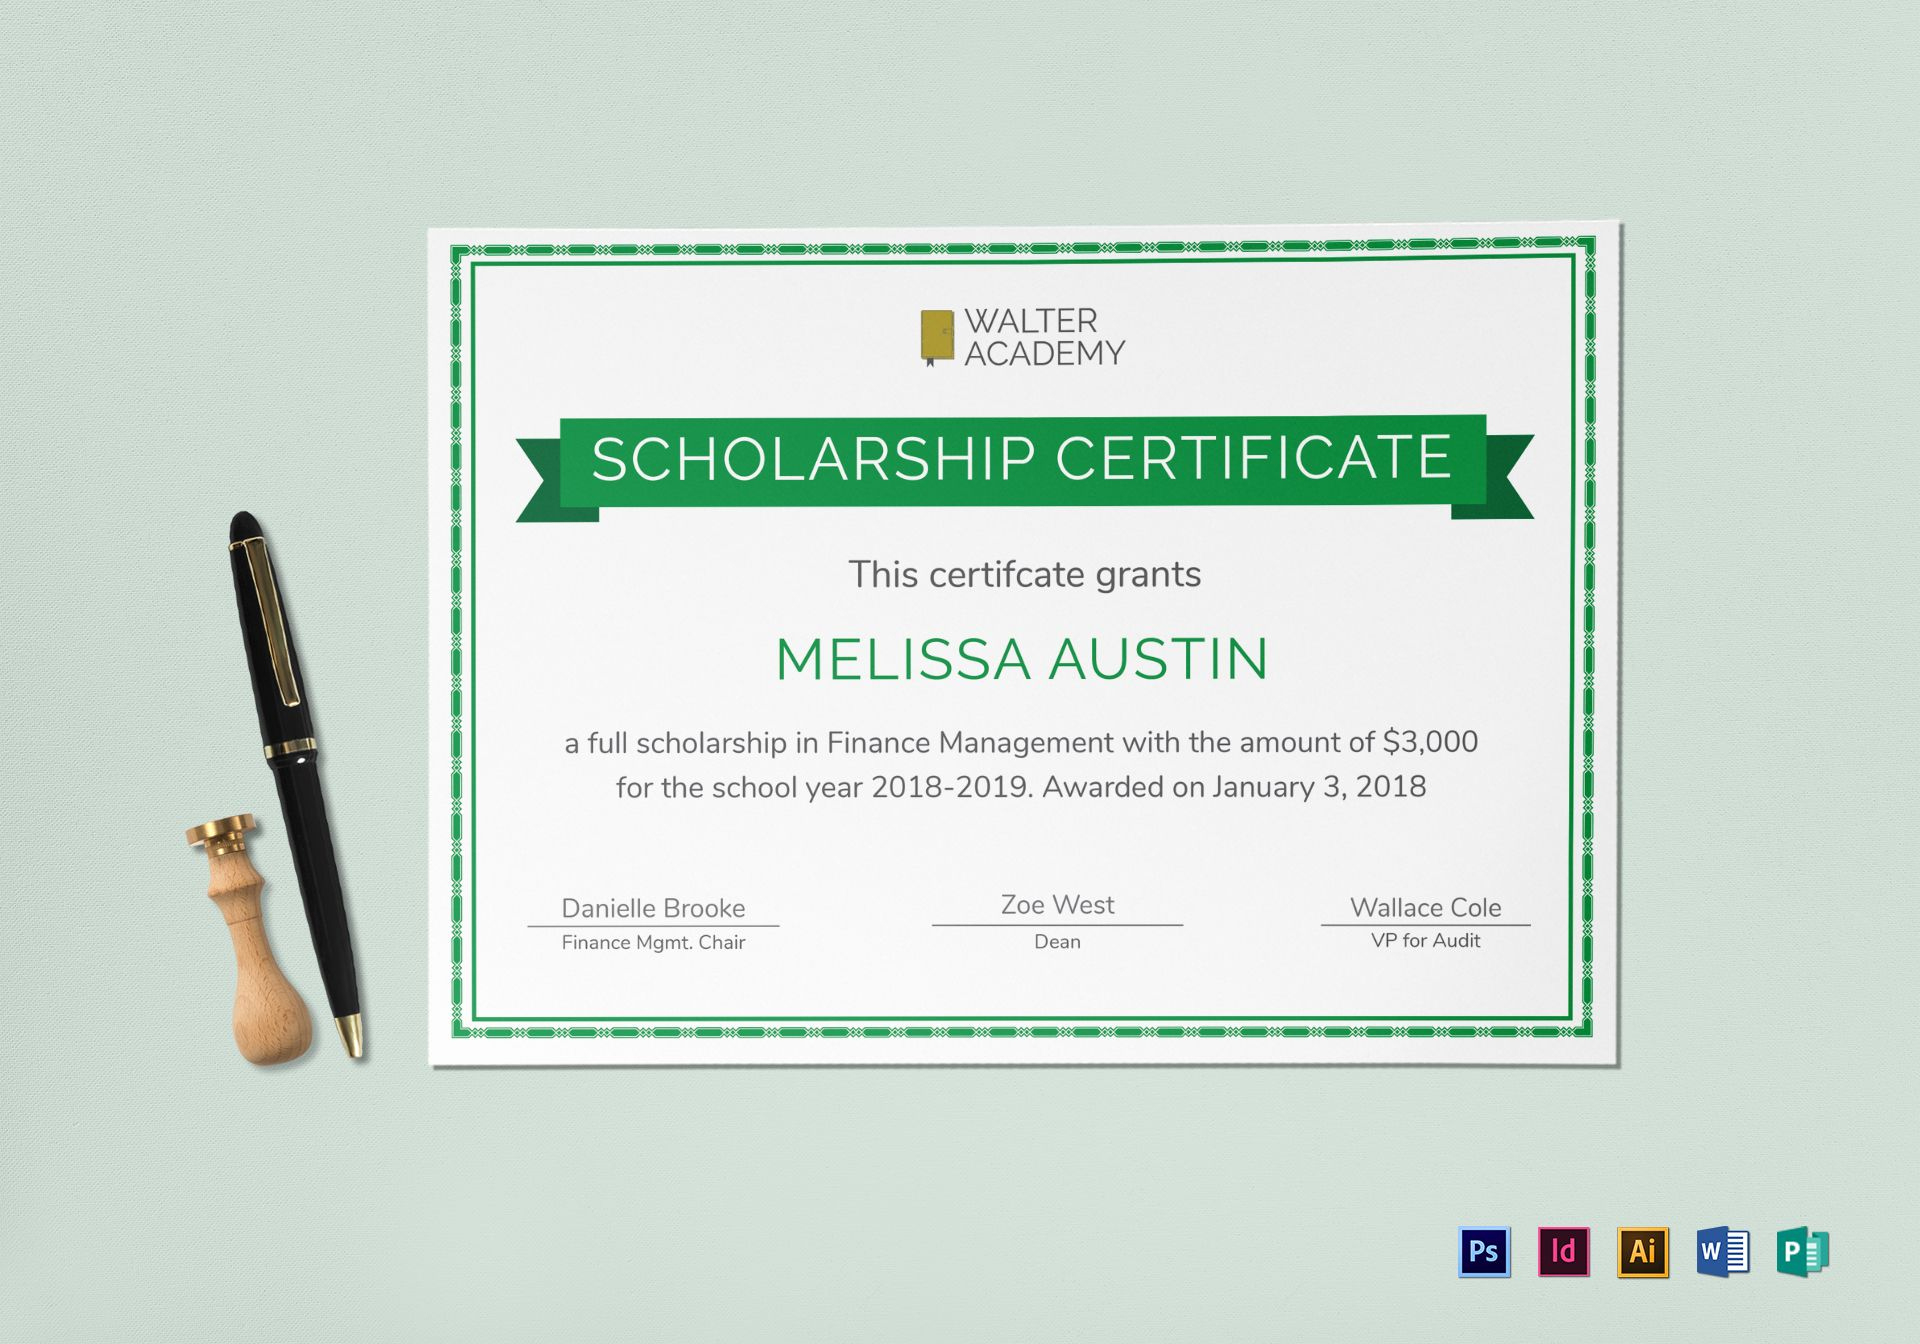 Scholarship Certificate Template Inside Indesign with regard to Free Indesign Certificate Template